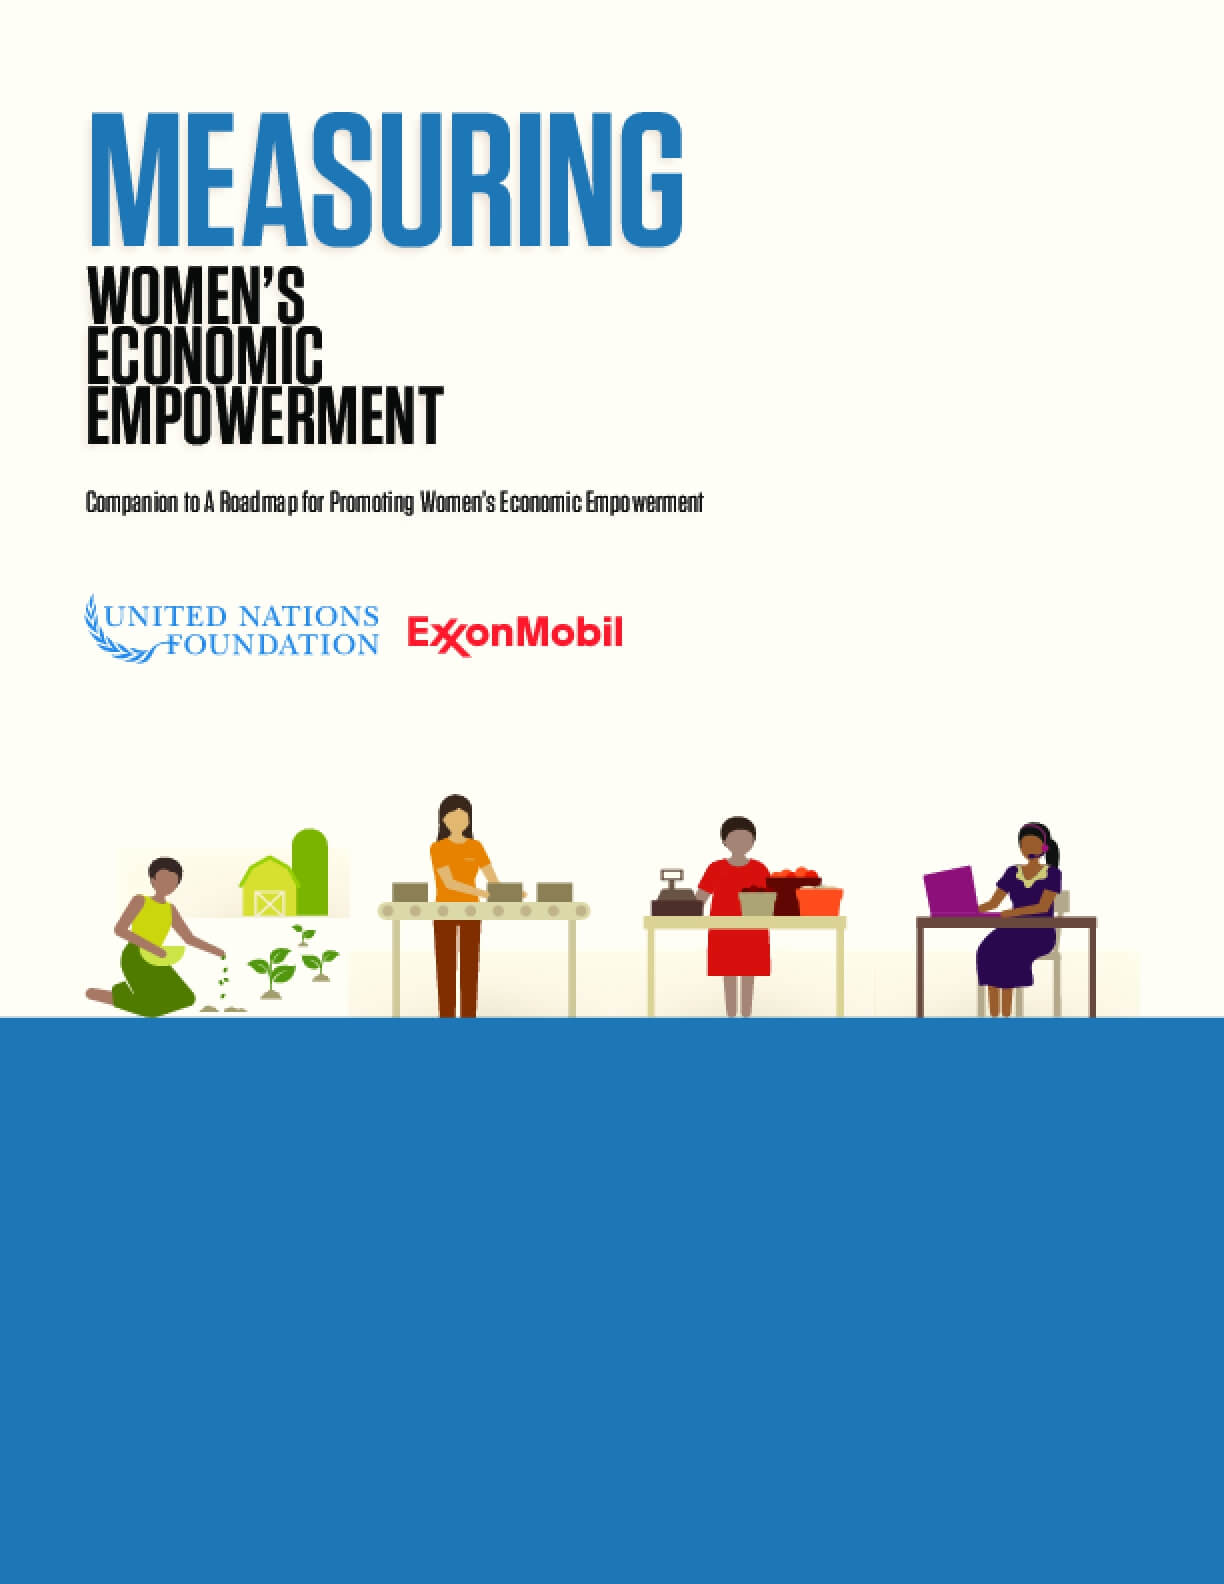 Measuring Women's Economic Empowerment